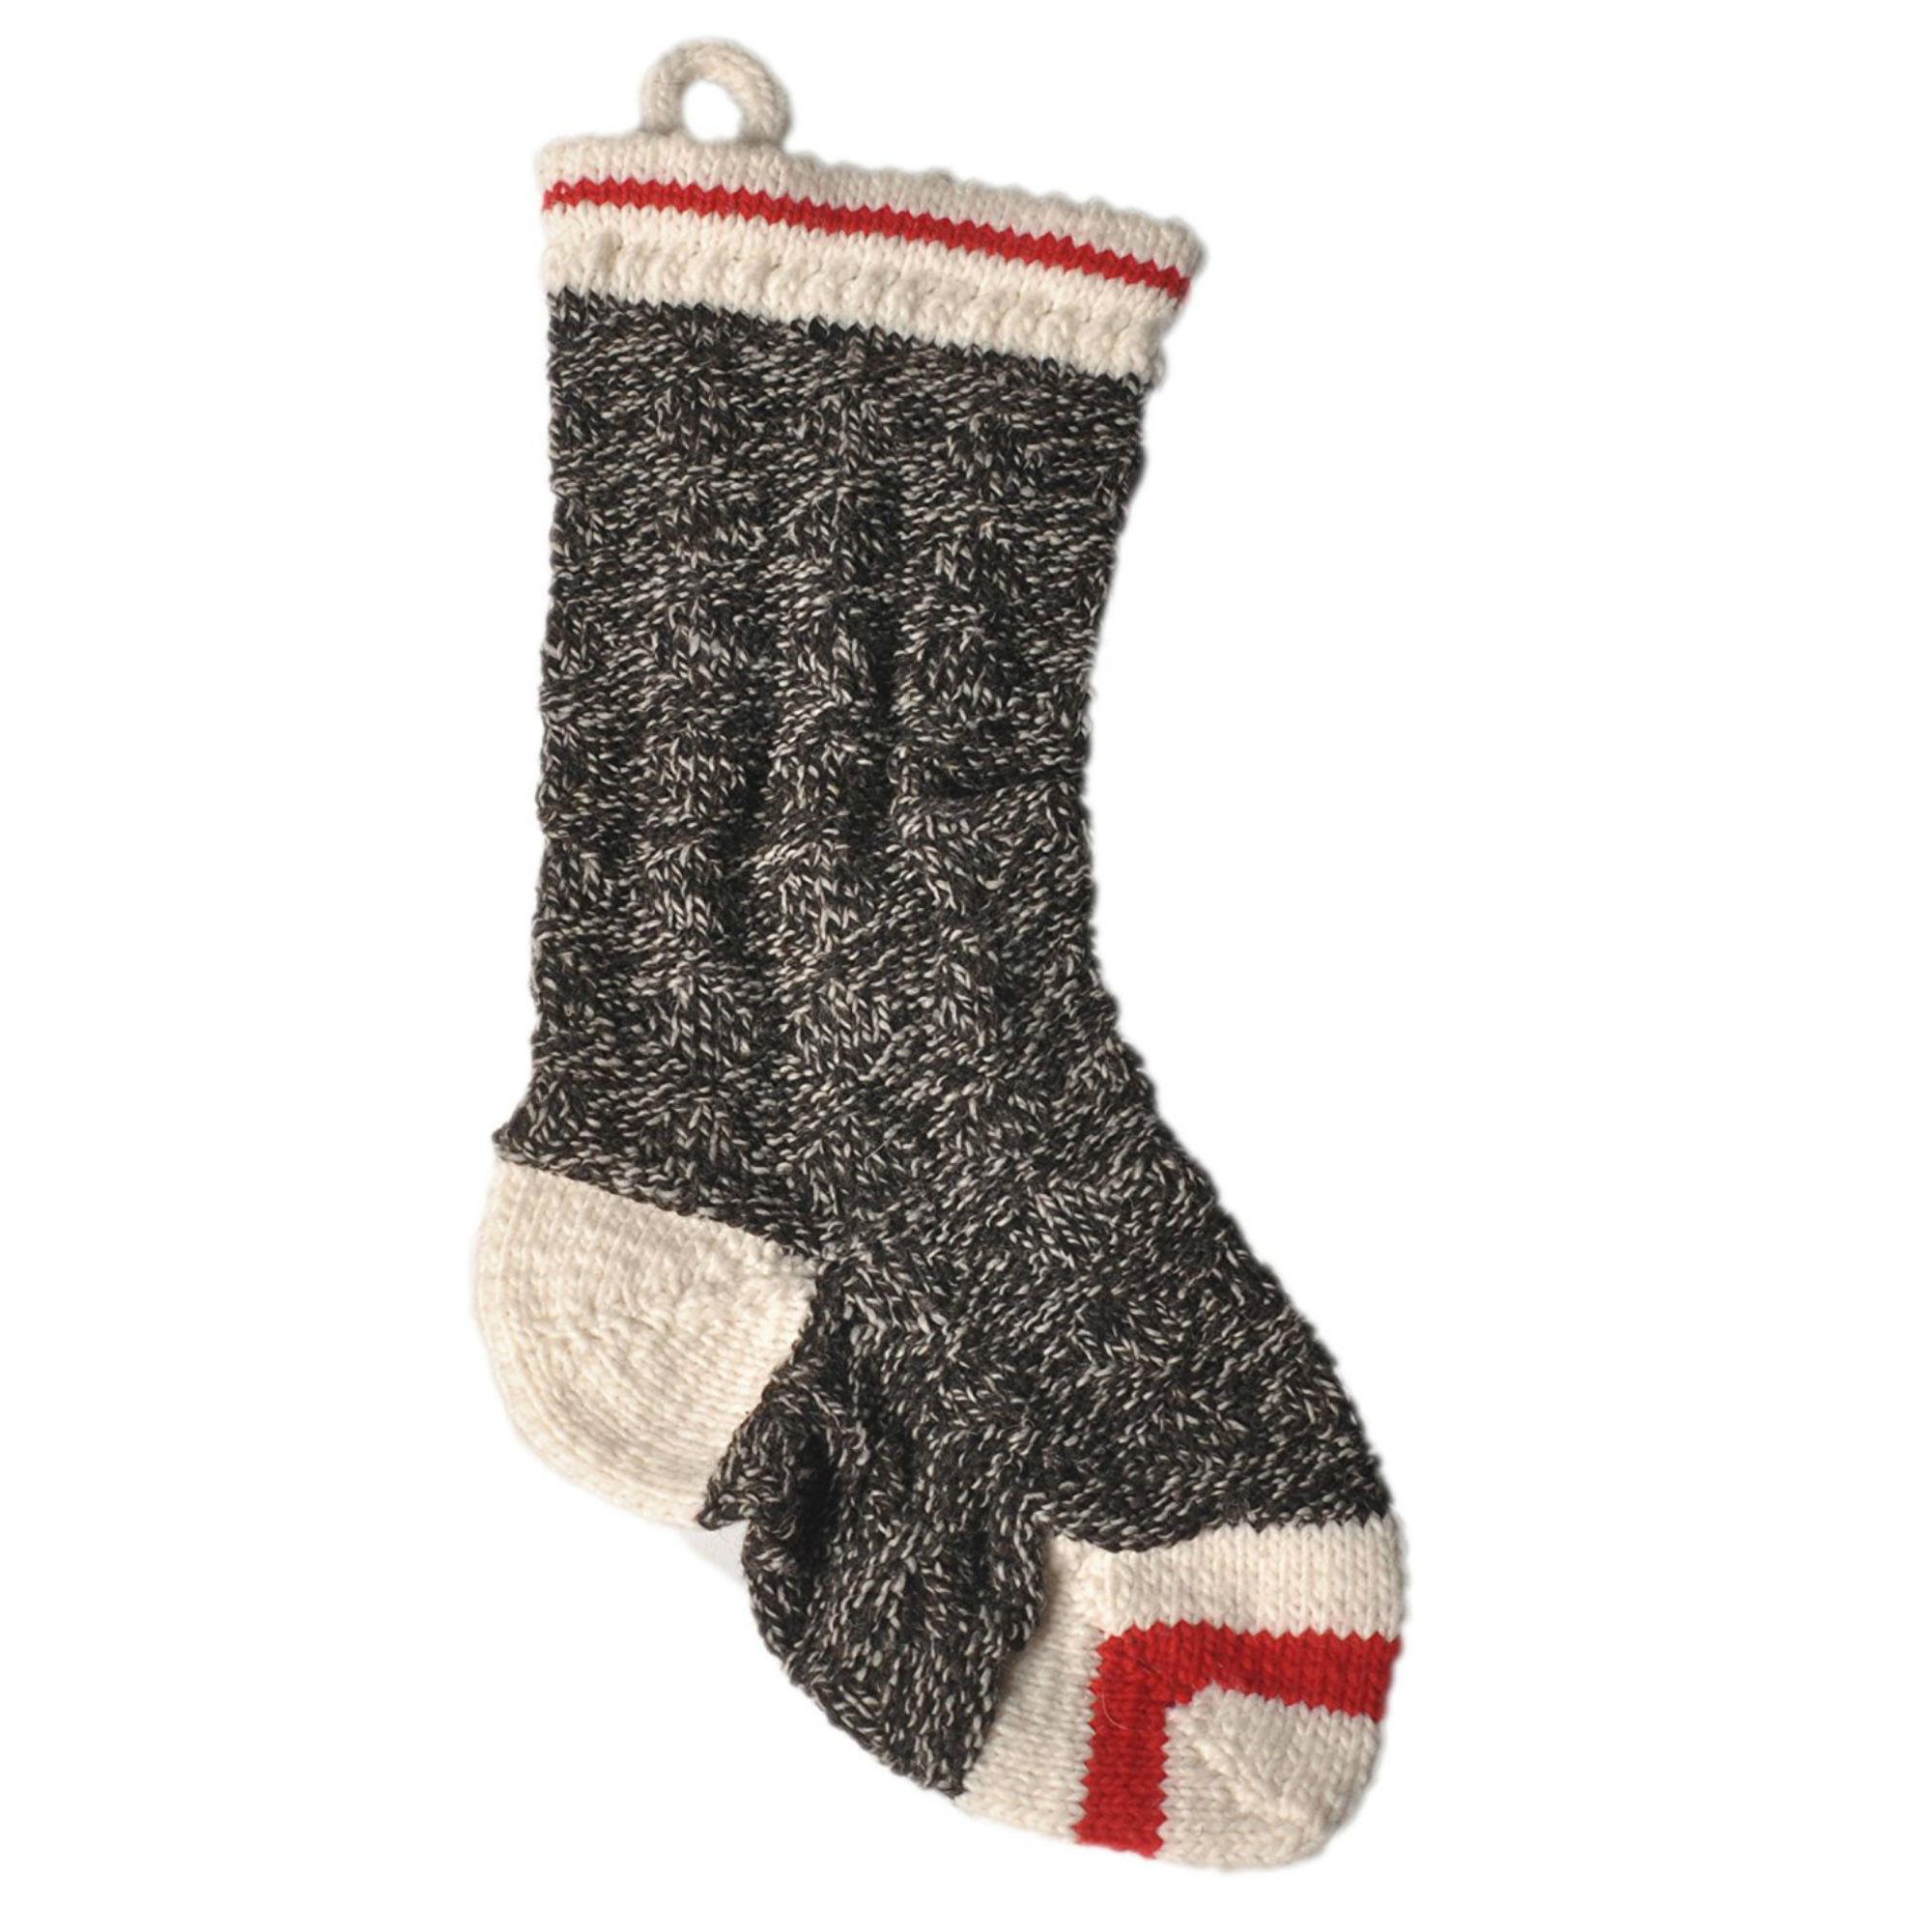 Handmade Wool Christmas Dog Stocking - Boyfriend